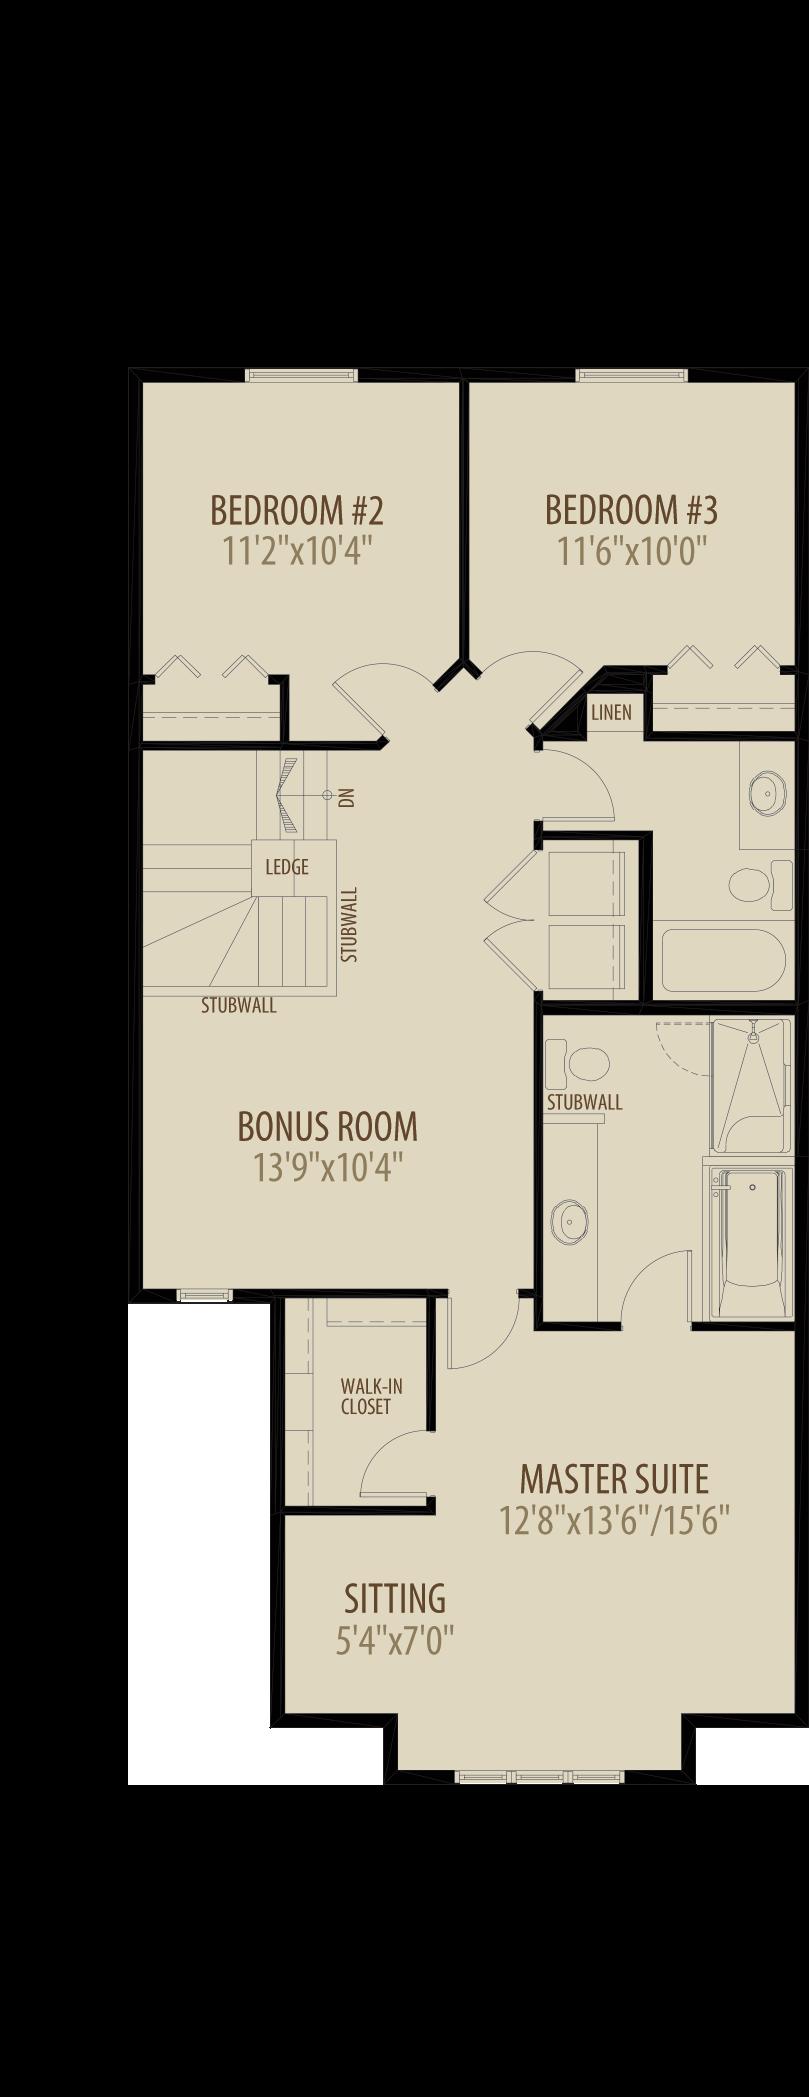 Optional Bonus Room adds 241 sq ft